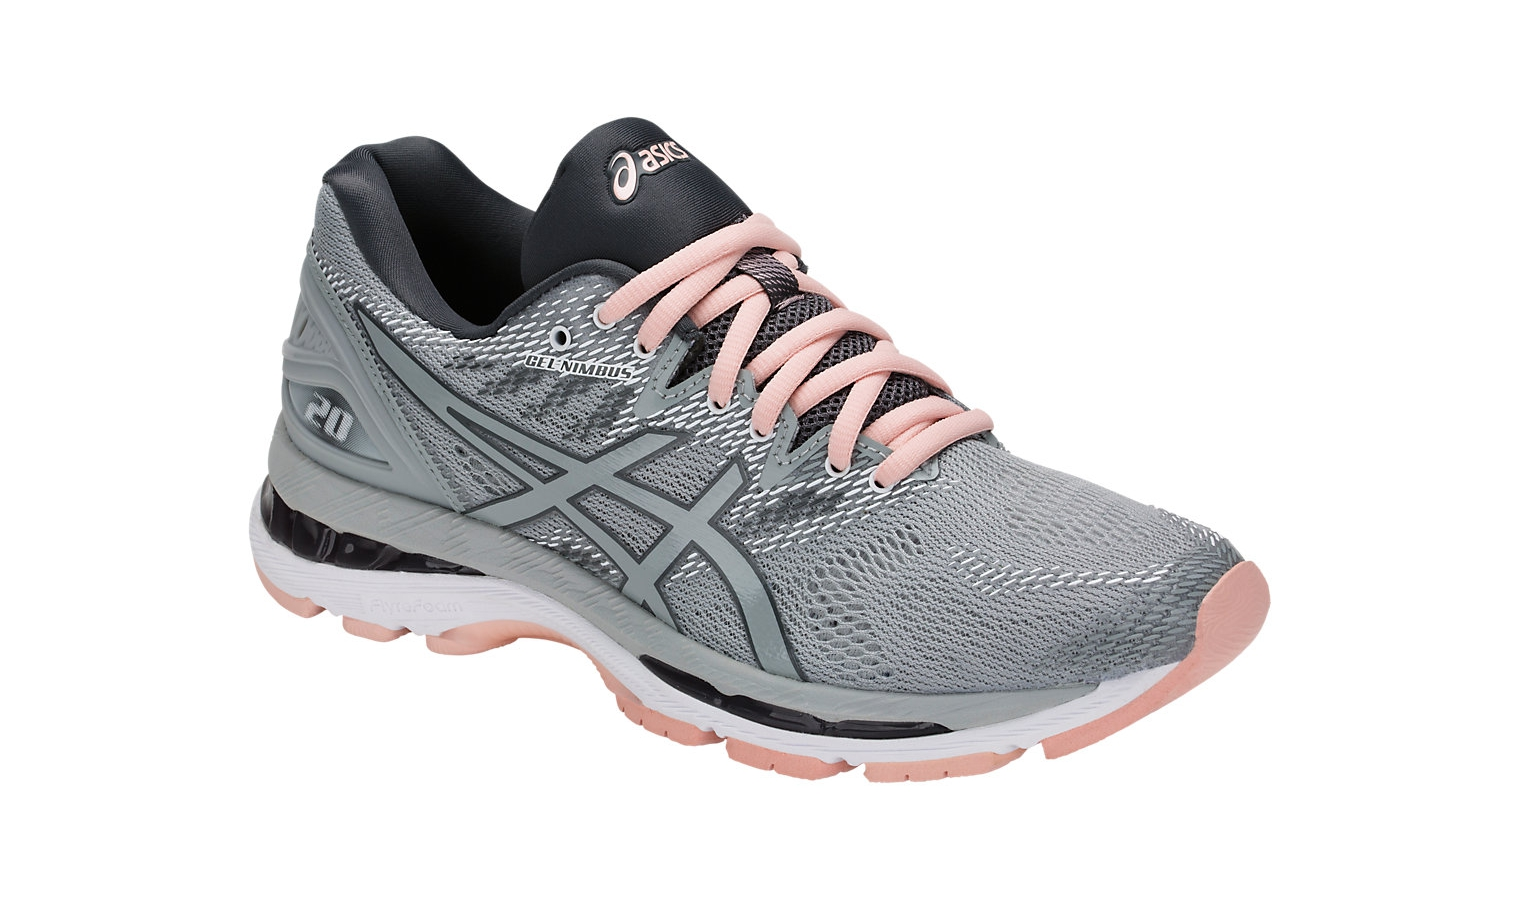 Dámske bežecké topánky Asics GEL-NIMBUS 20 W šedé  d2fa69b2857